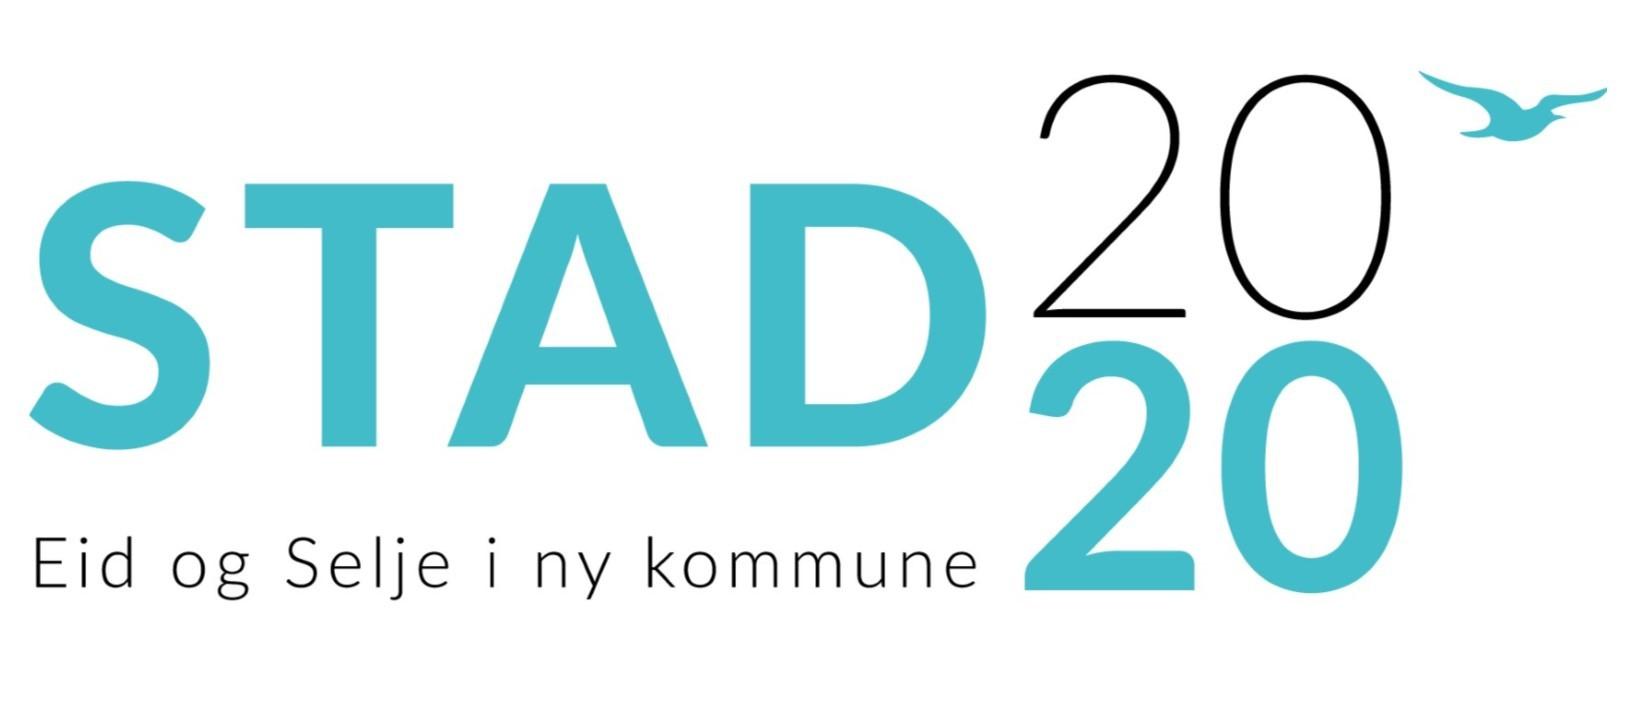 Stad2020 logo.jpg